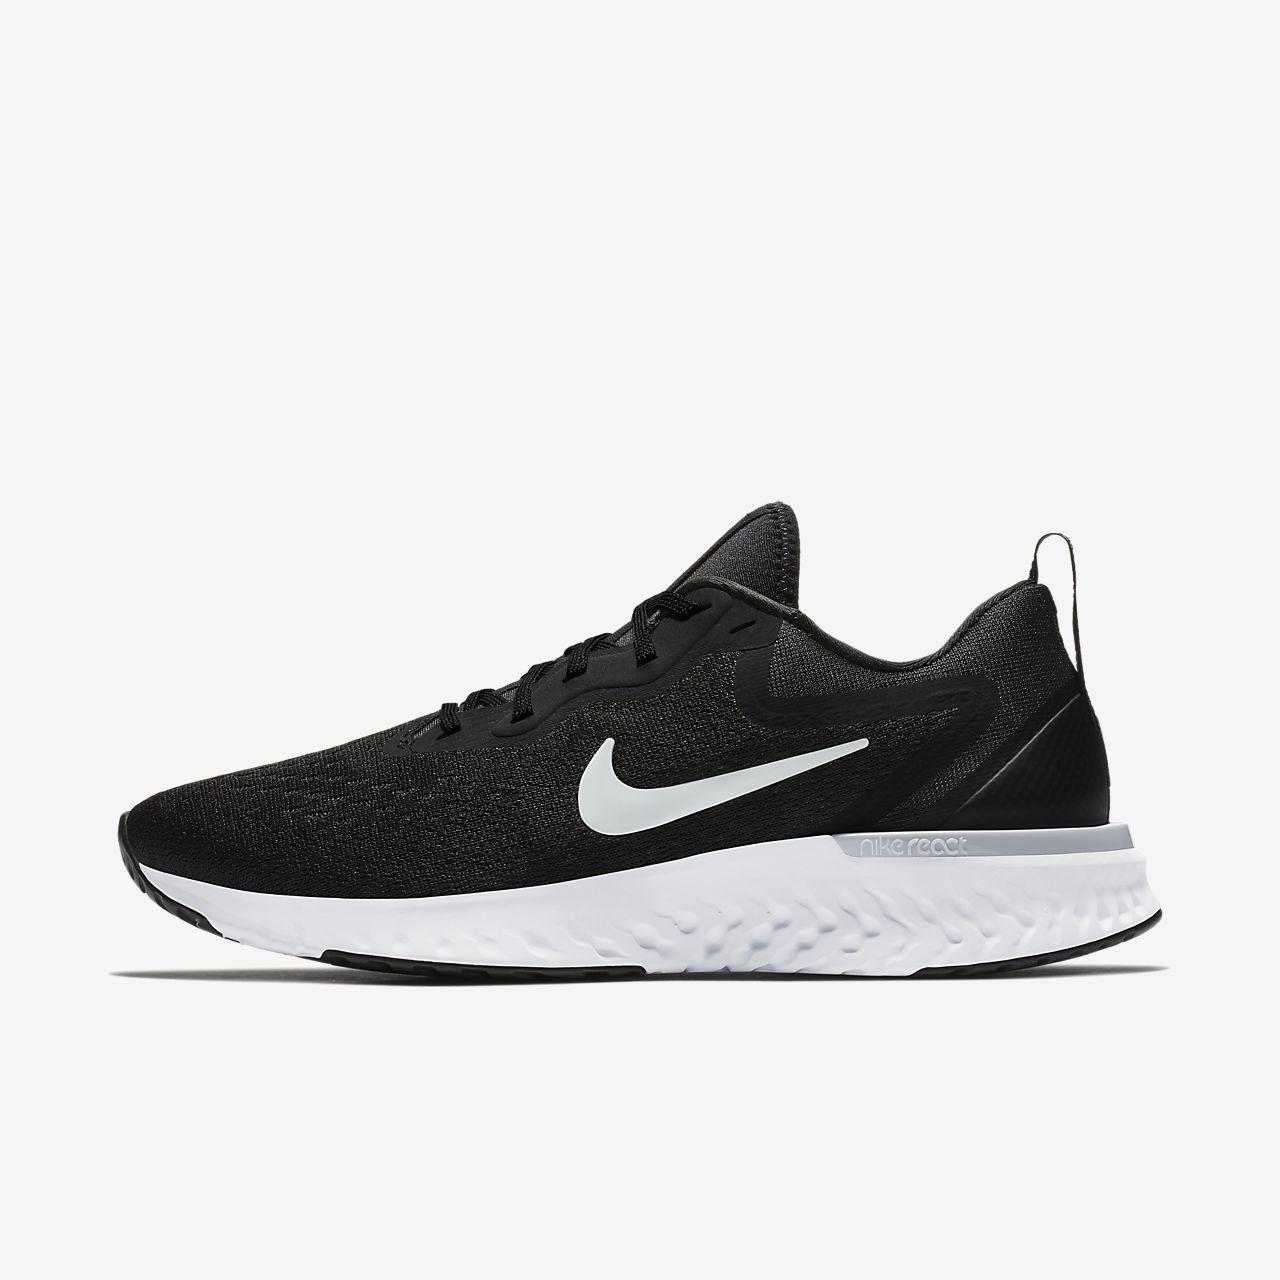 Nike Donna Scarpe da corsa Wmns Nike Nike Odyssey REAGIRE W NERO BIANCO